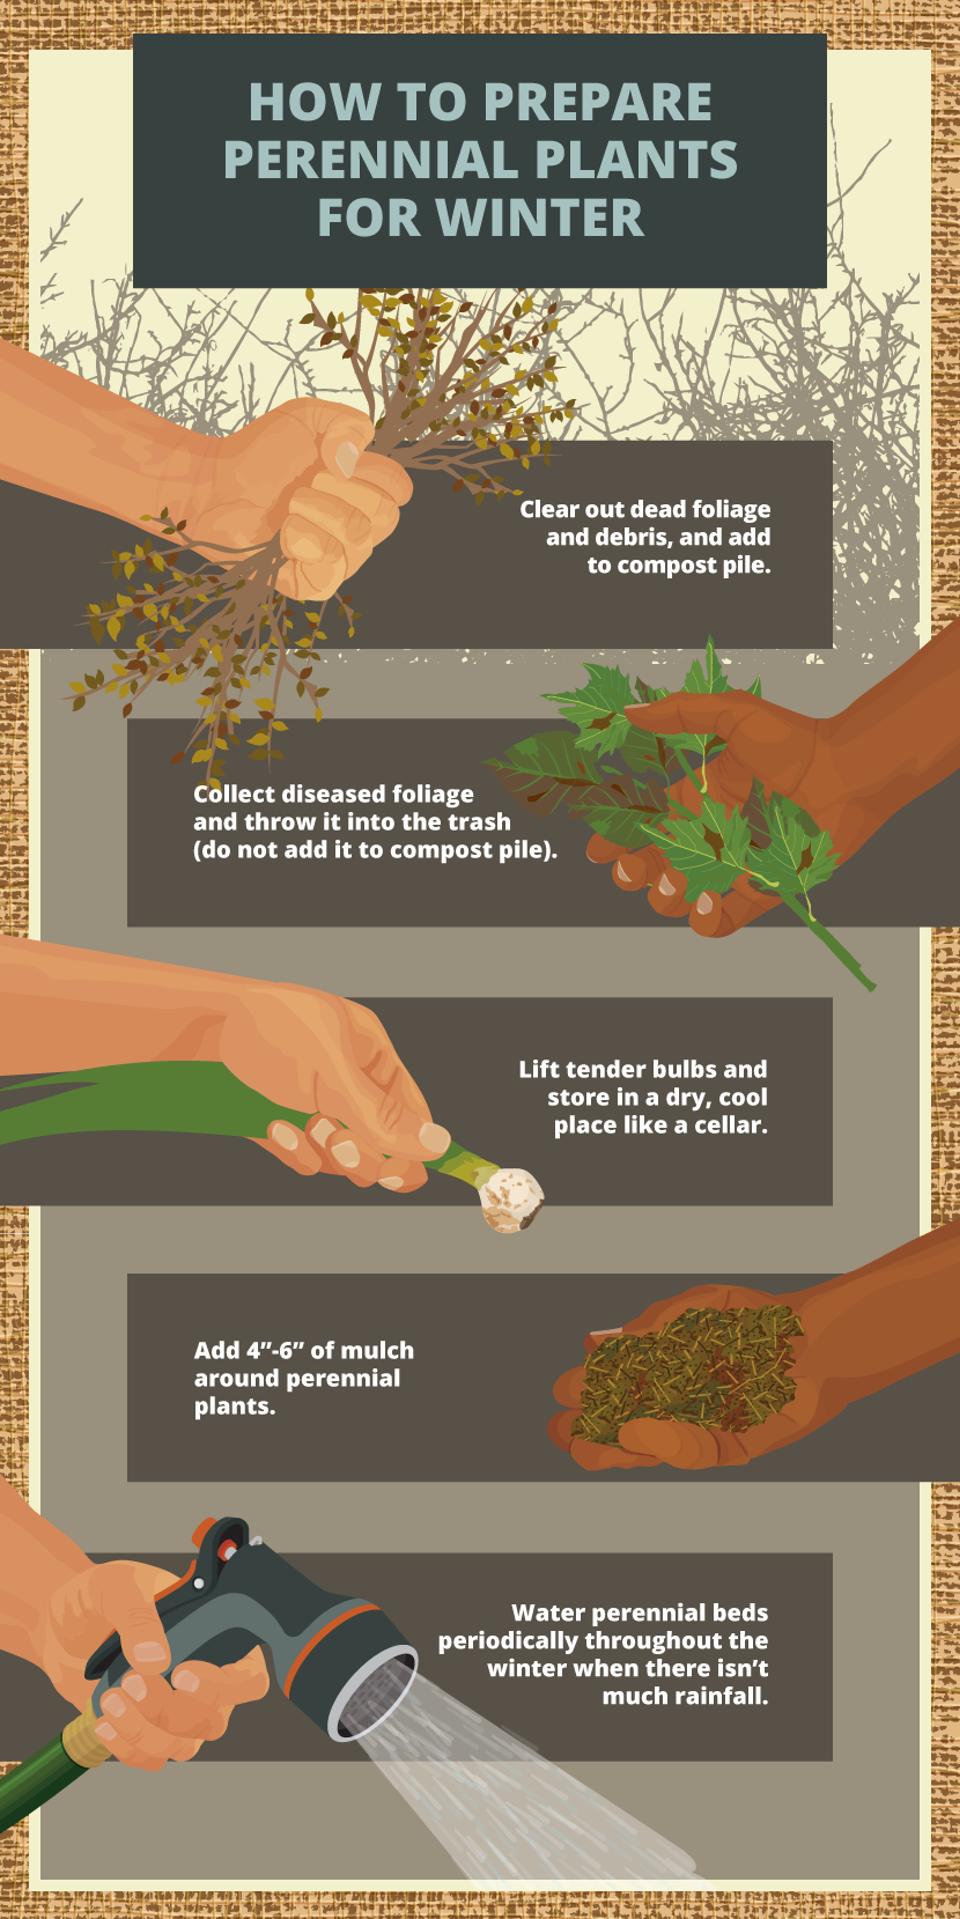 prepare perennials garden for winter